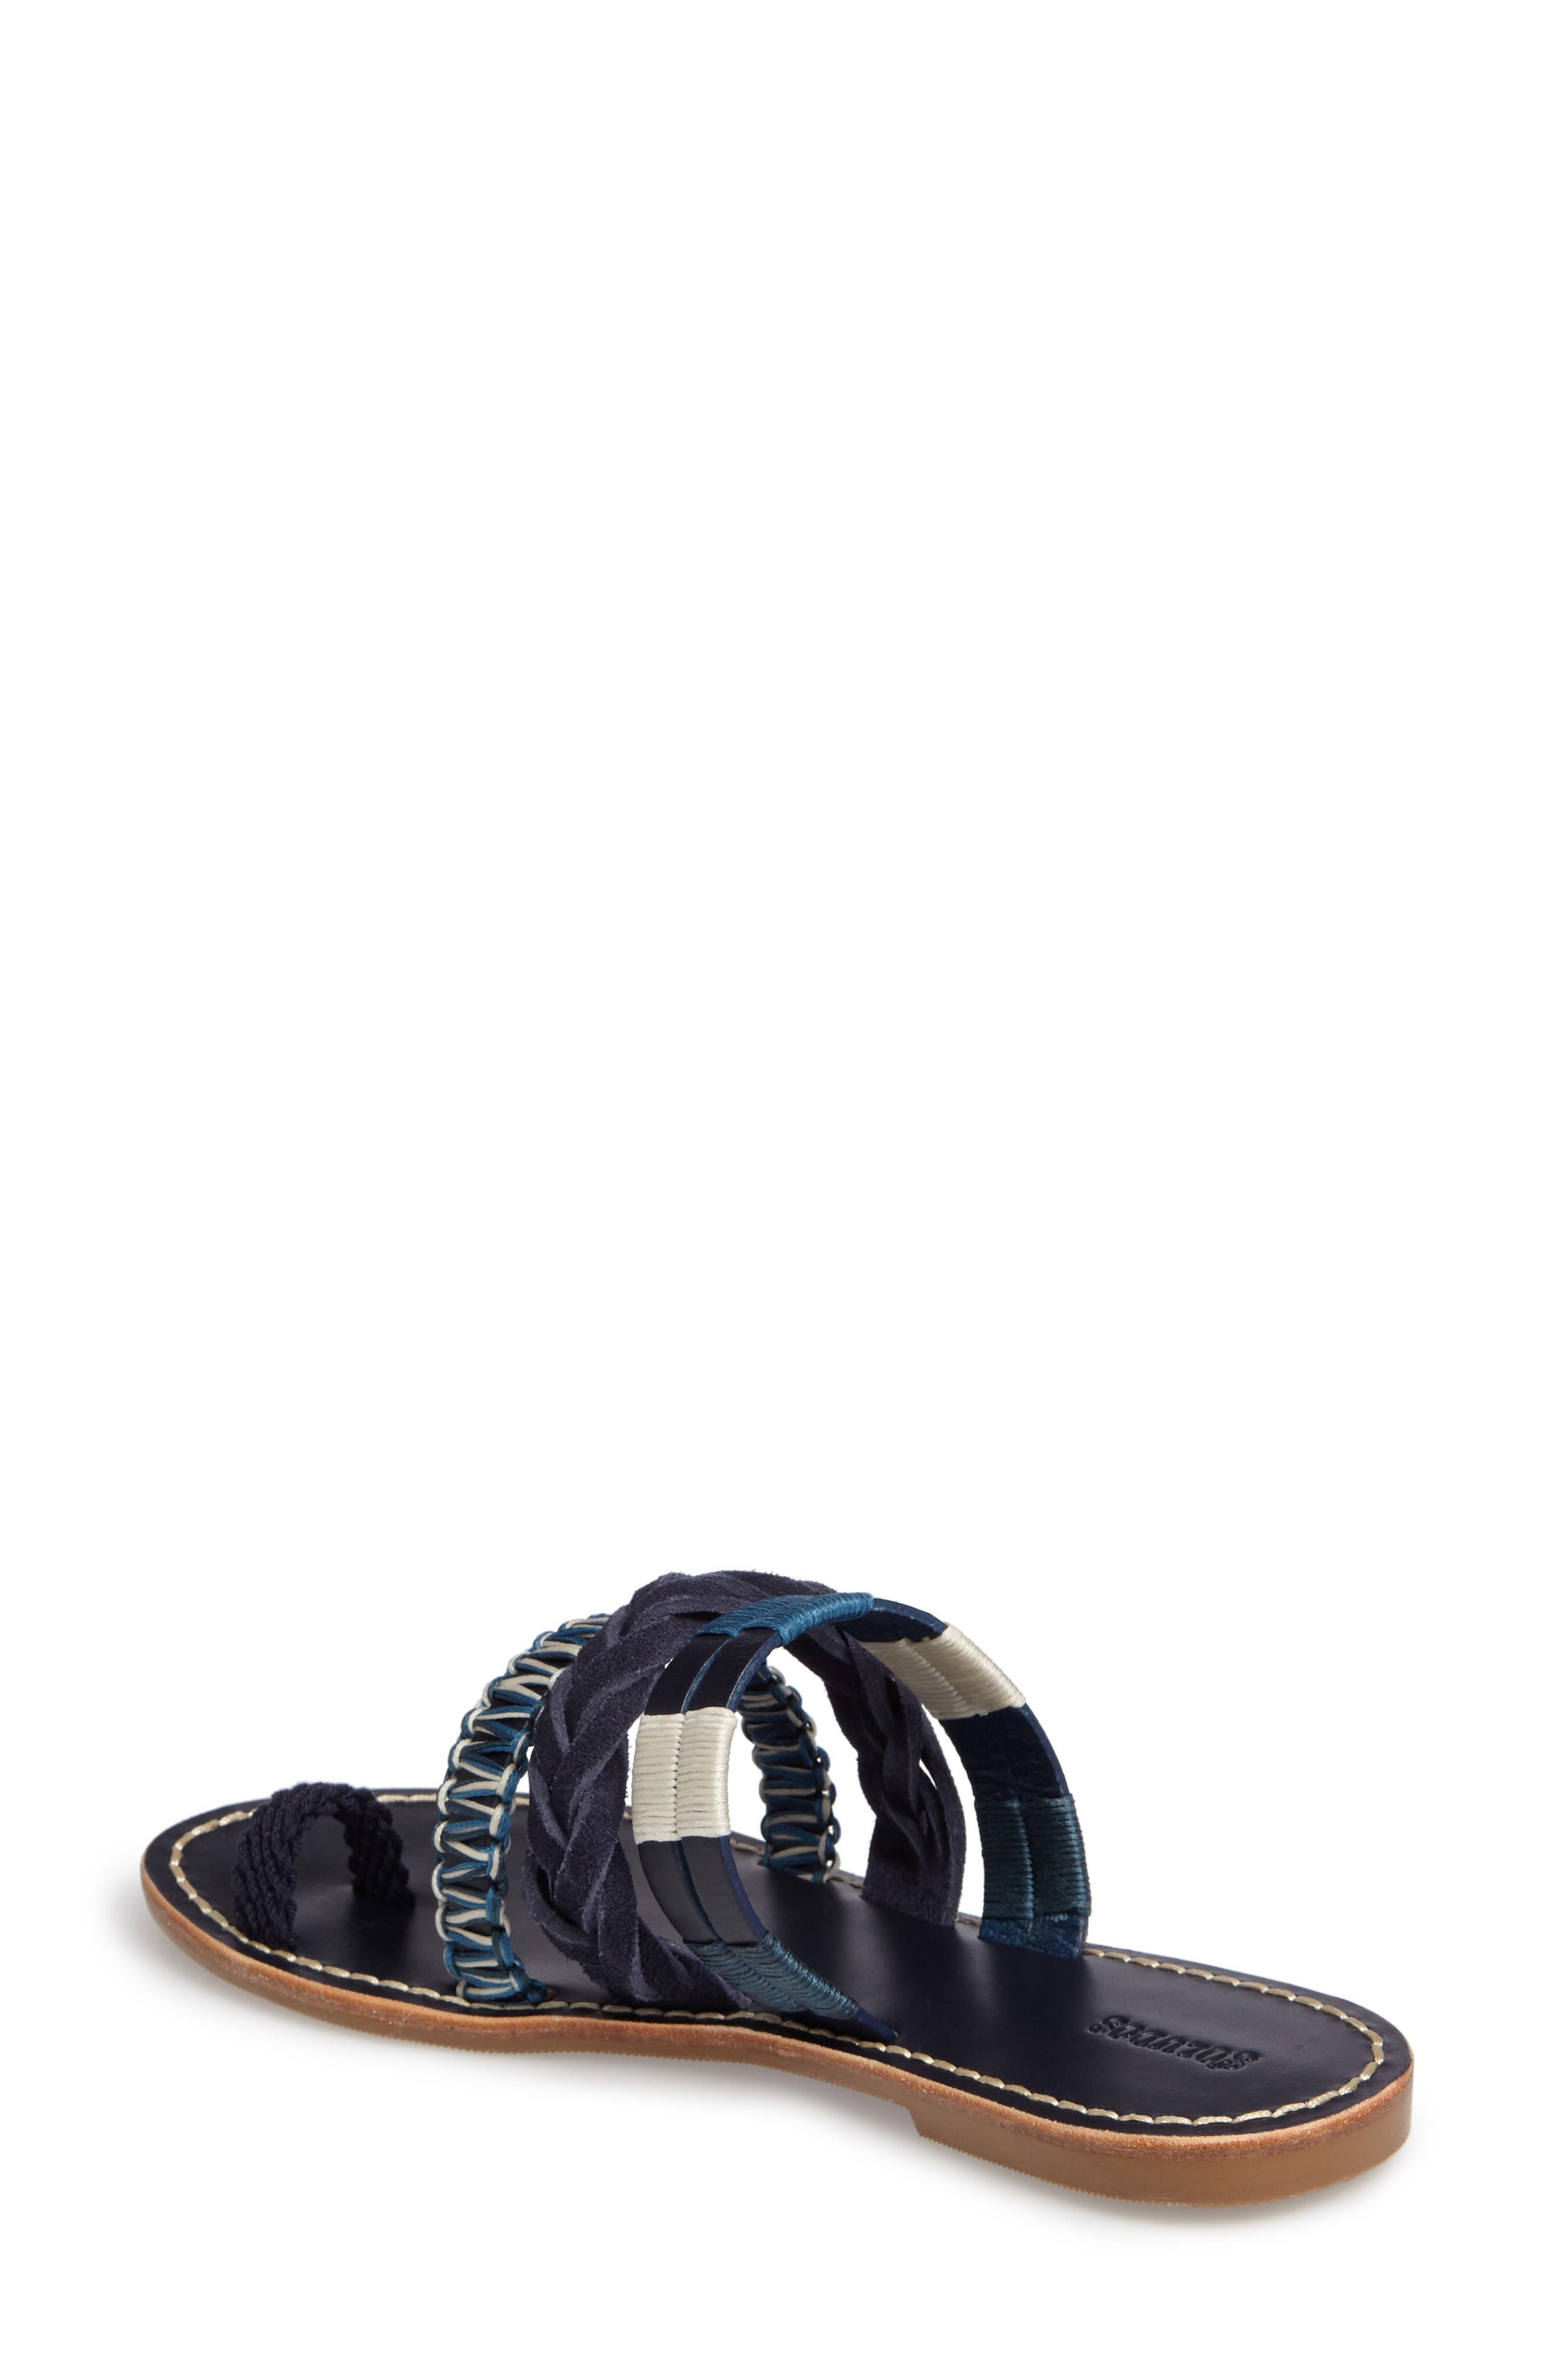 Slide Sandal,                             Alternate thumbnail 3, color,                             Midnight/ Blue Multi Leather